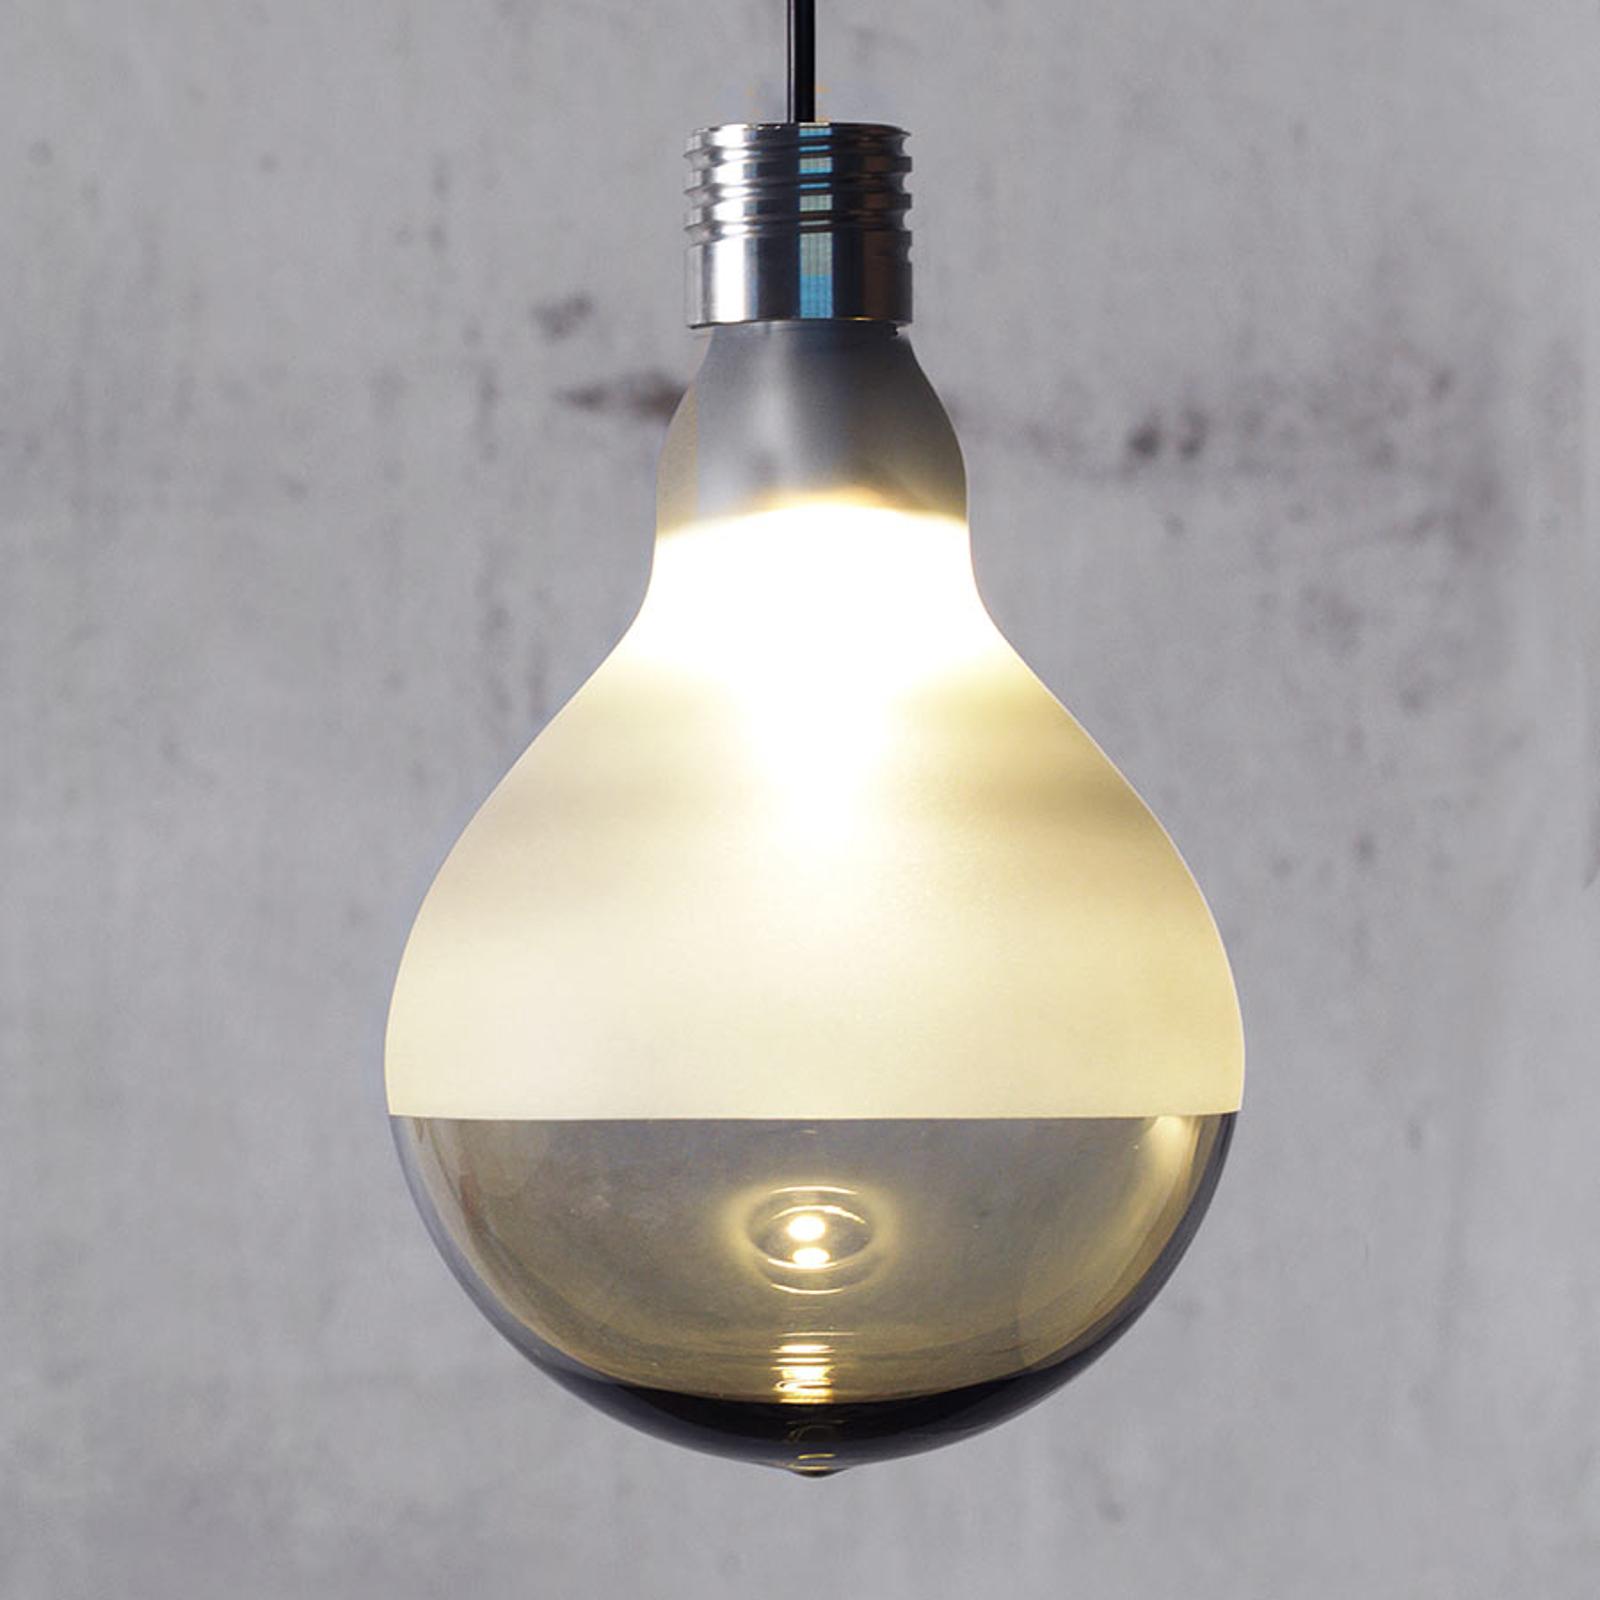 Karman Makeup - lampa wisząca LED, okrągła